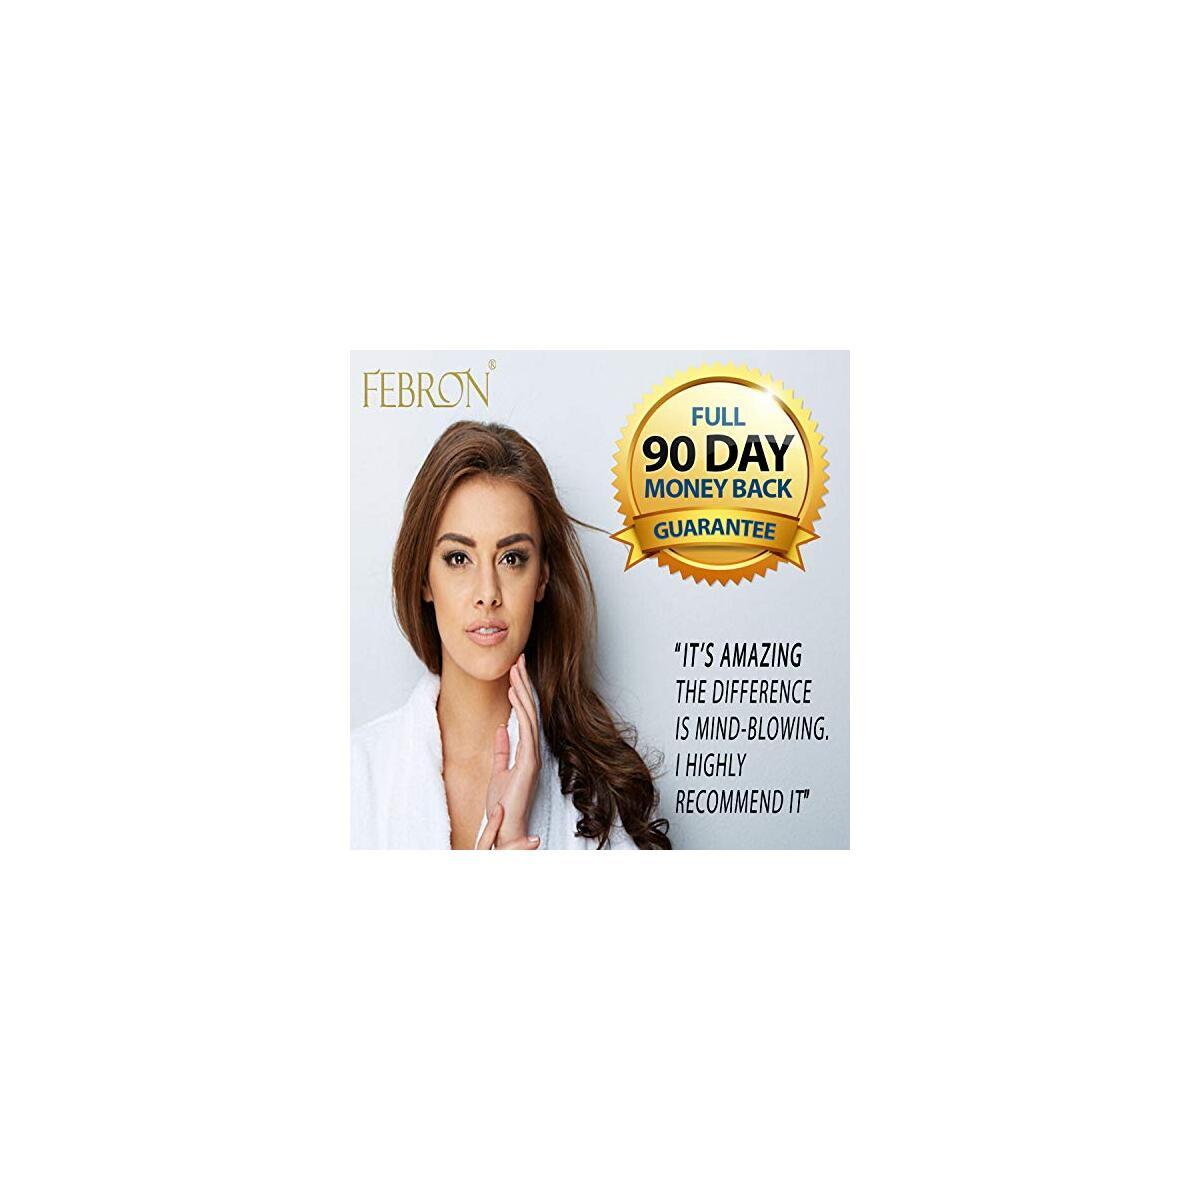 Hair Growth Pills, BIOTIN 10000 mcg + SAW PALMETTO 500mg Vitamins + DHT Blocker Supplement + Keratin, Prevent & Stop Hair Loss, Stimulate & Regrow Hair Follicles for Women & Men